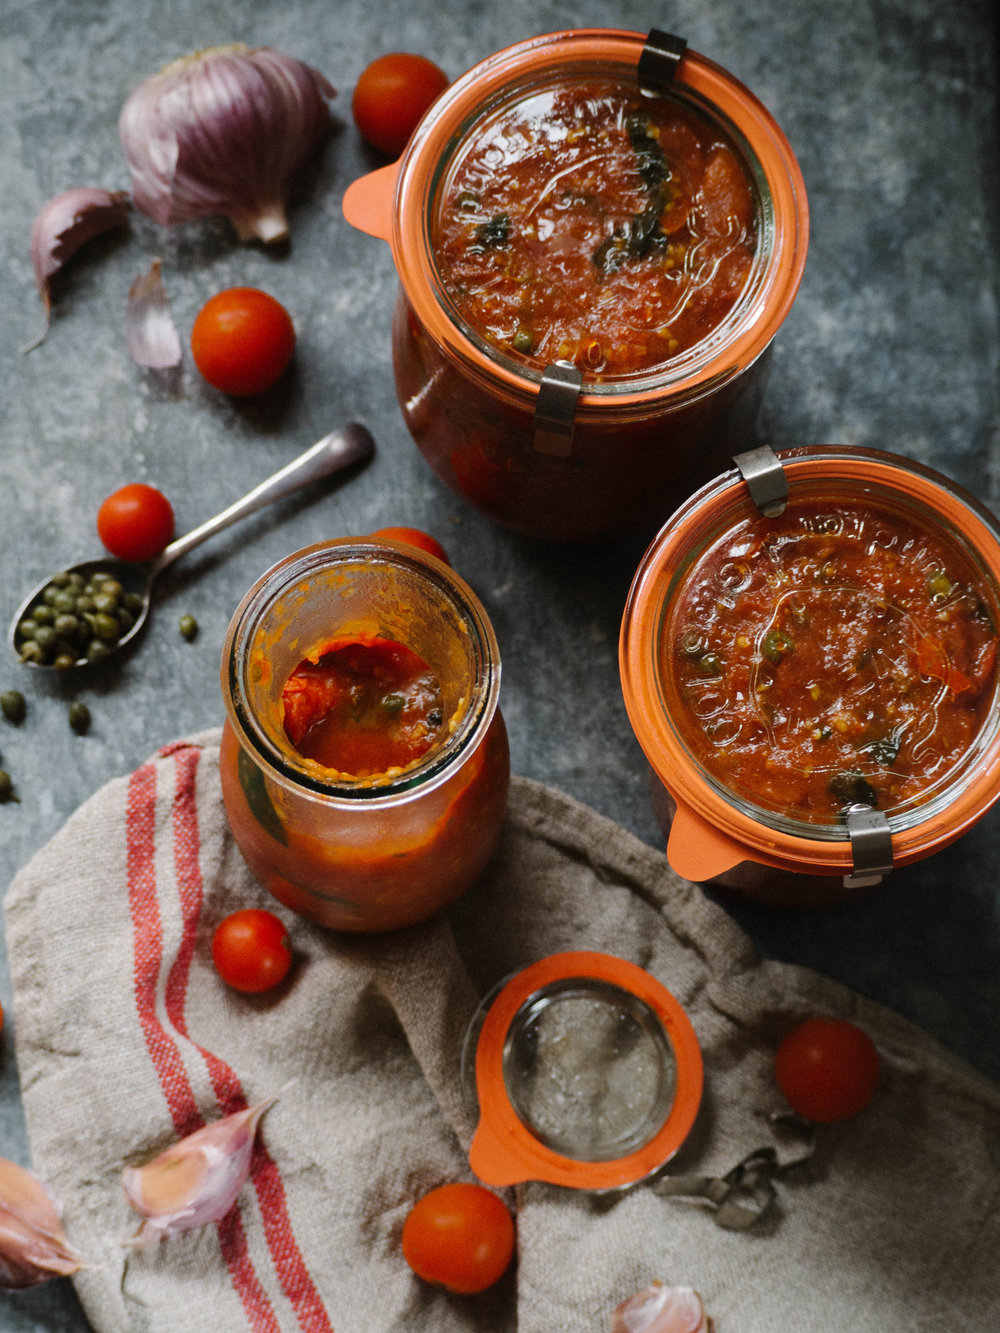 Homemade Chunky Tomato Sauce